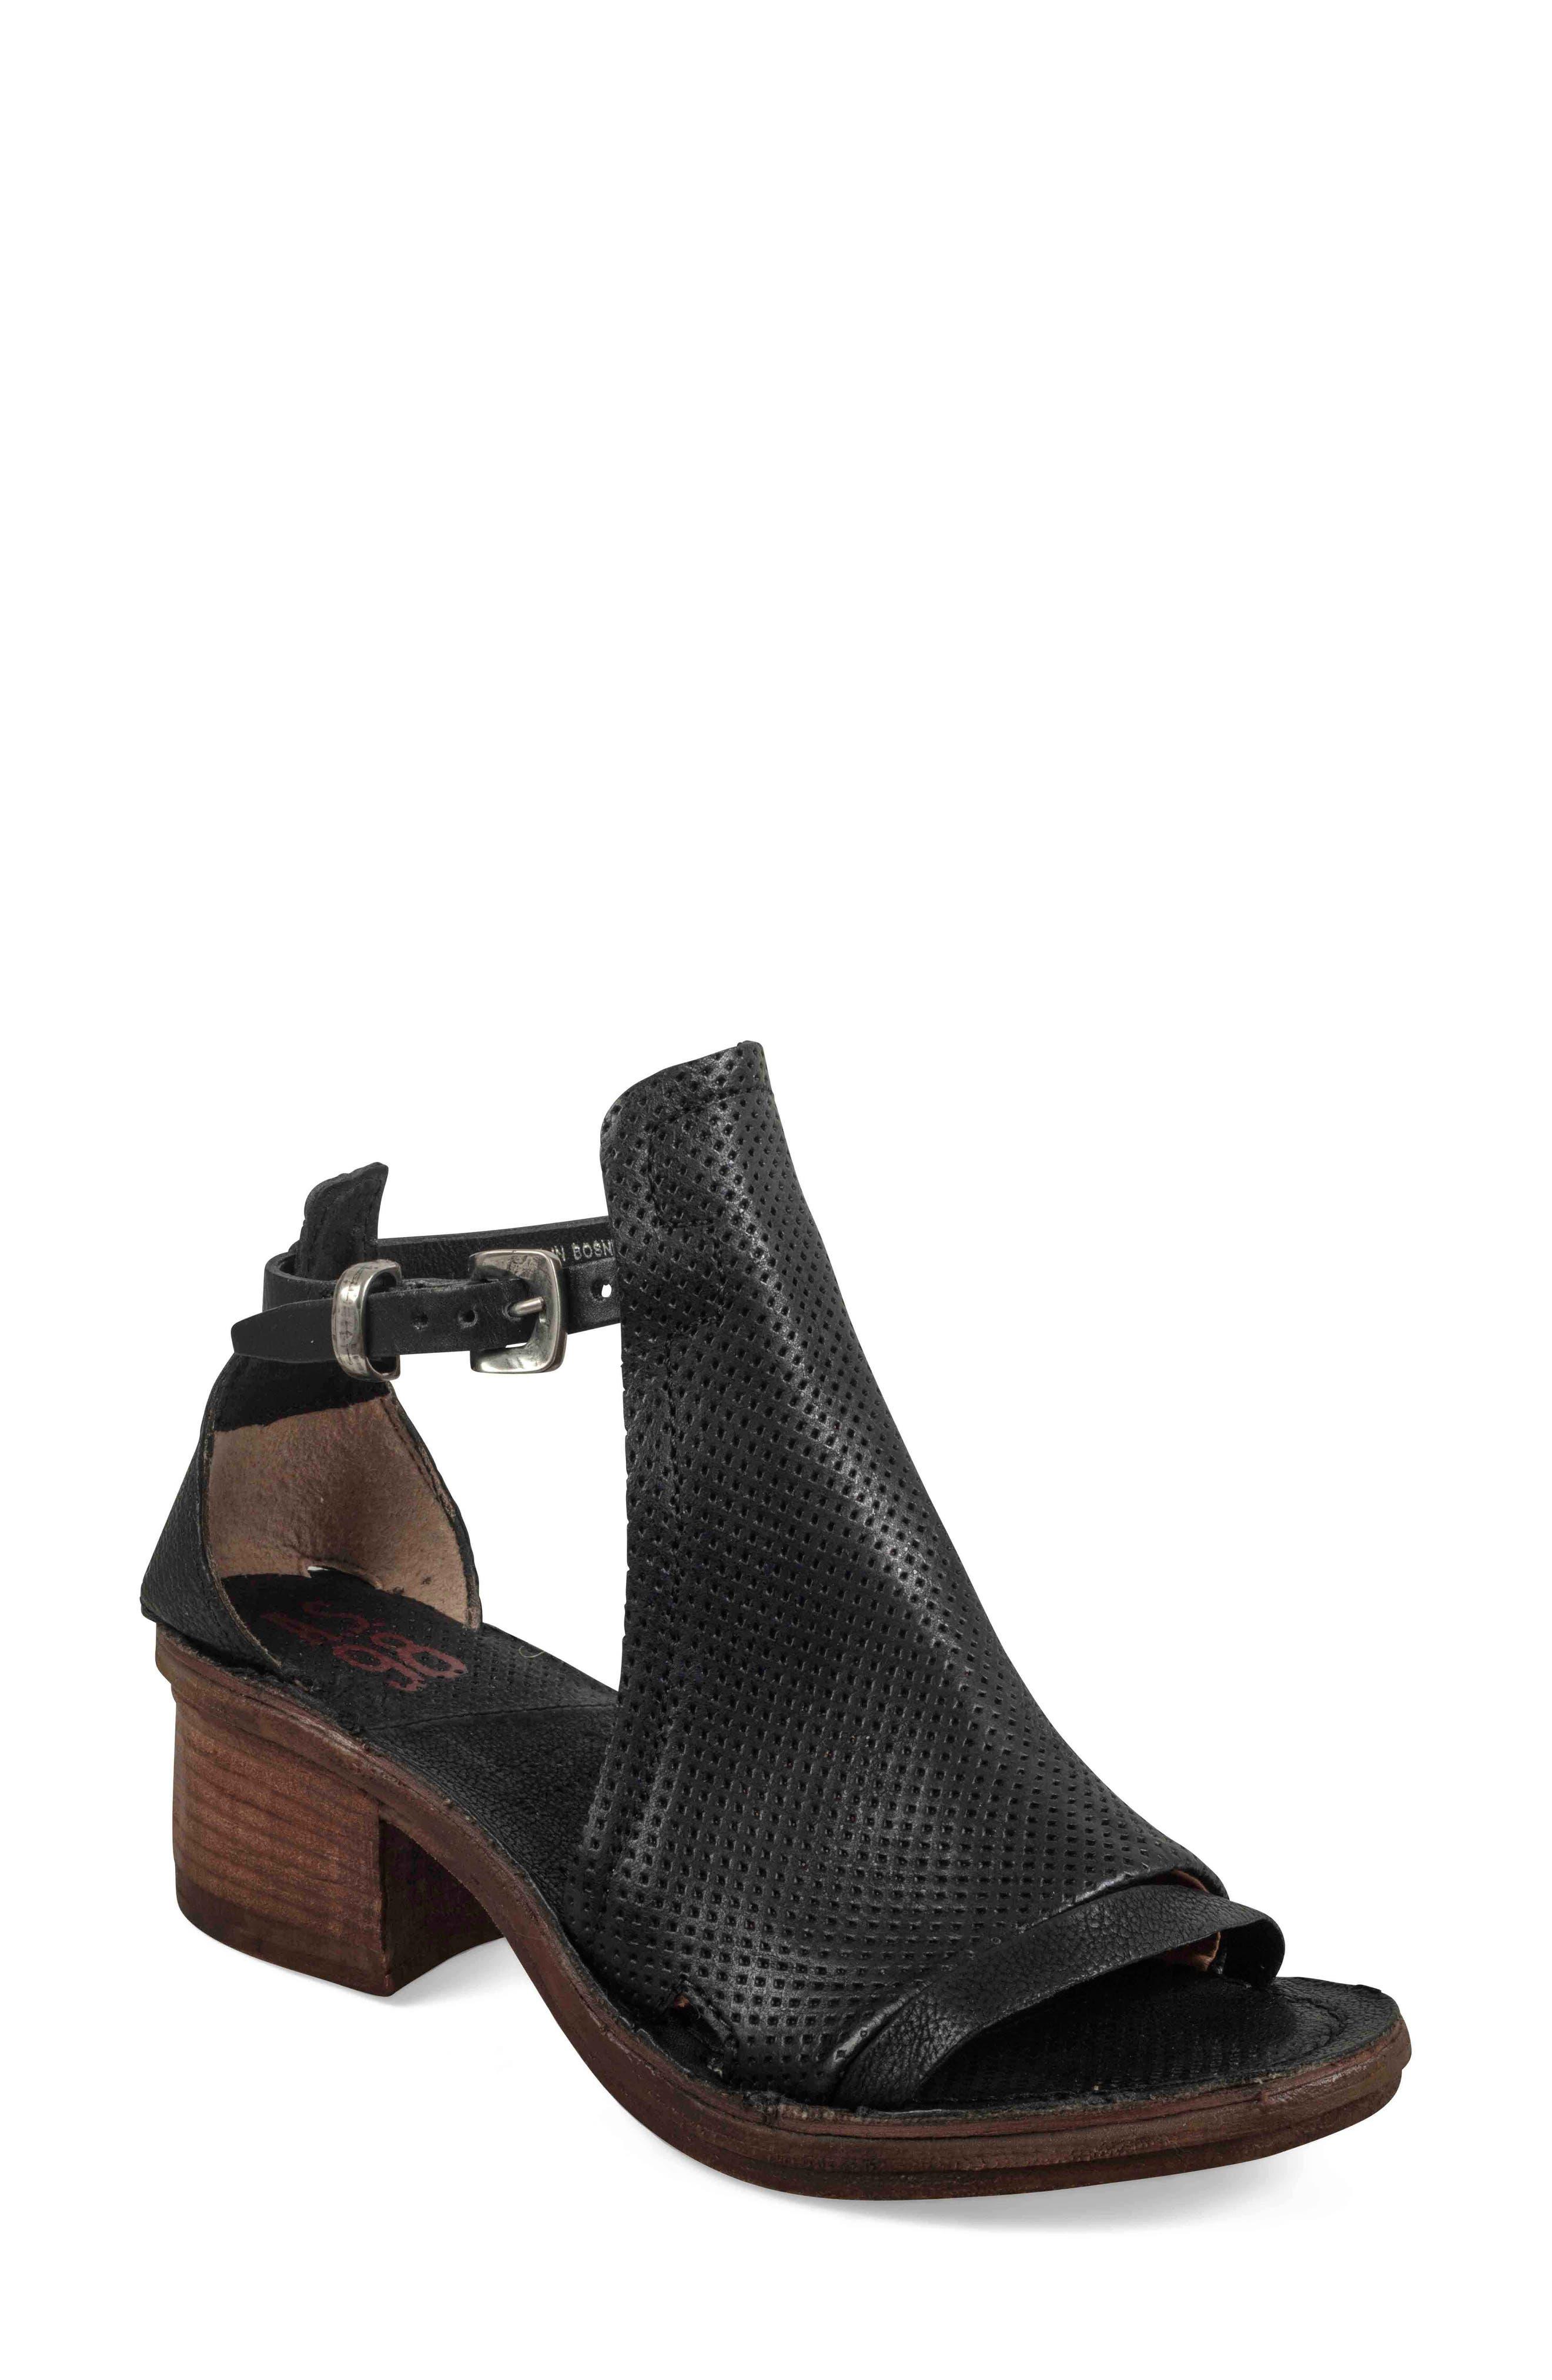 85682ecd4e116 Women s Sandals New Arrivals  Clothing